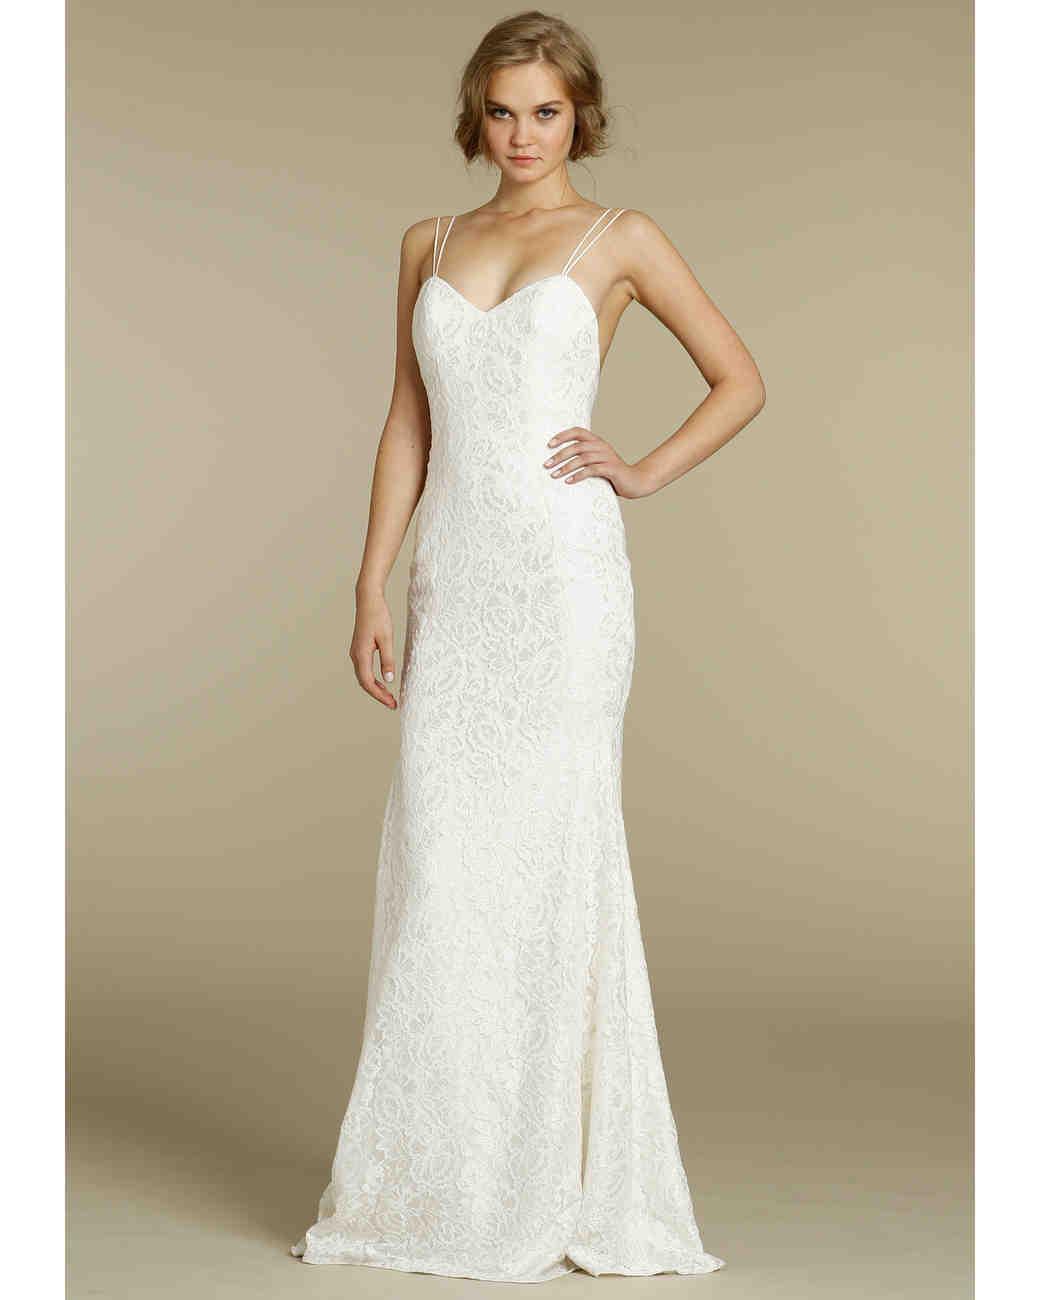 The Cheapest Wedding Dress